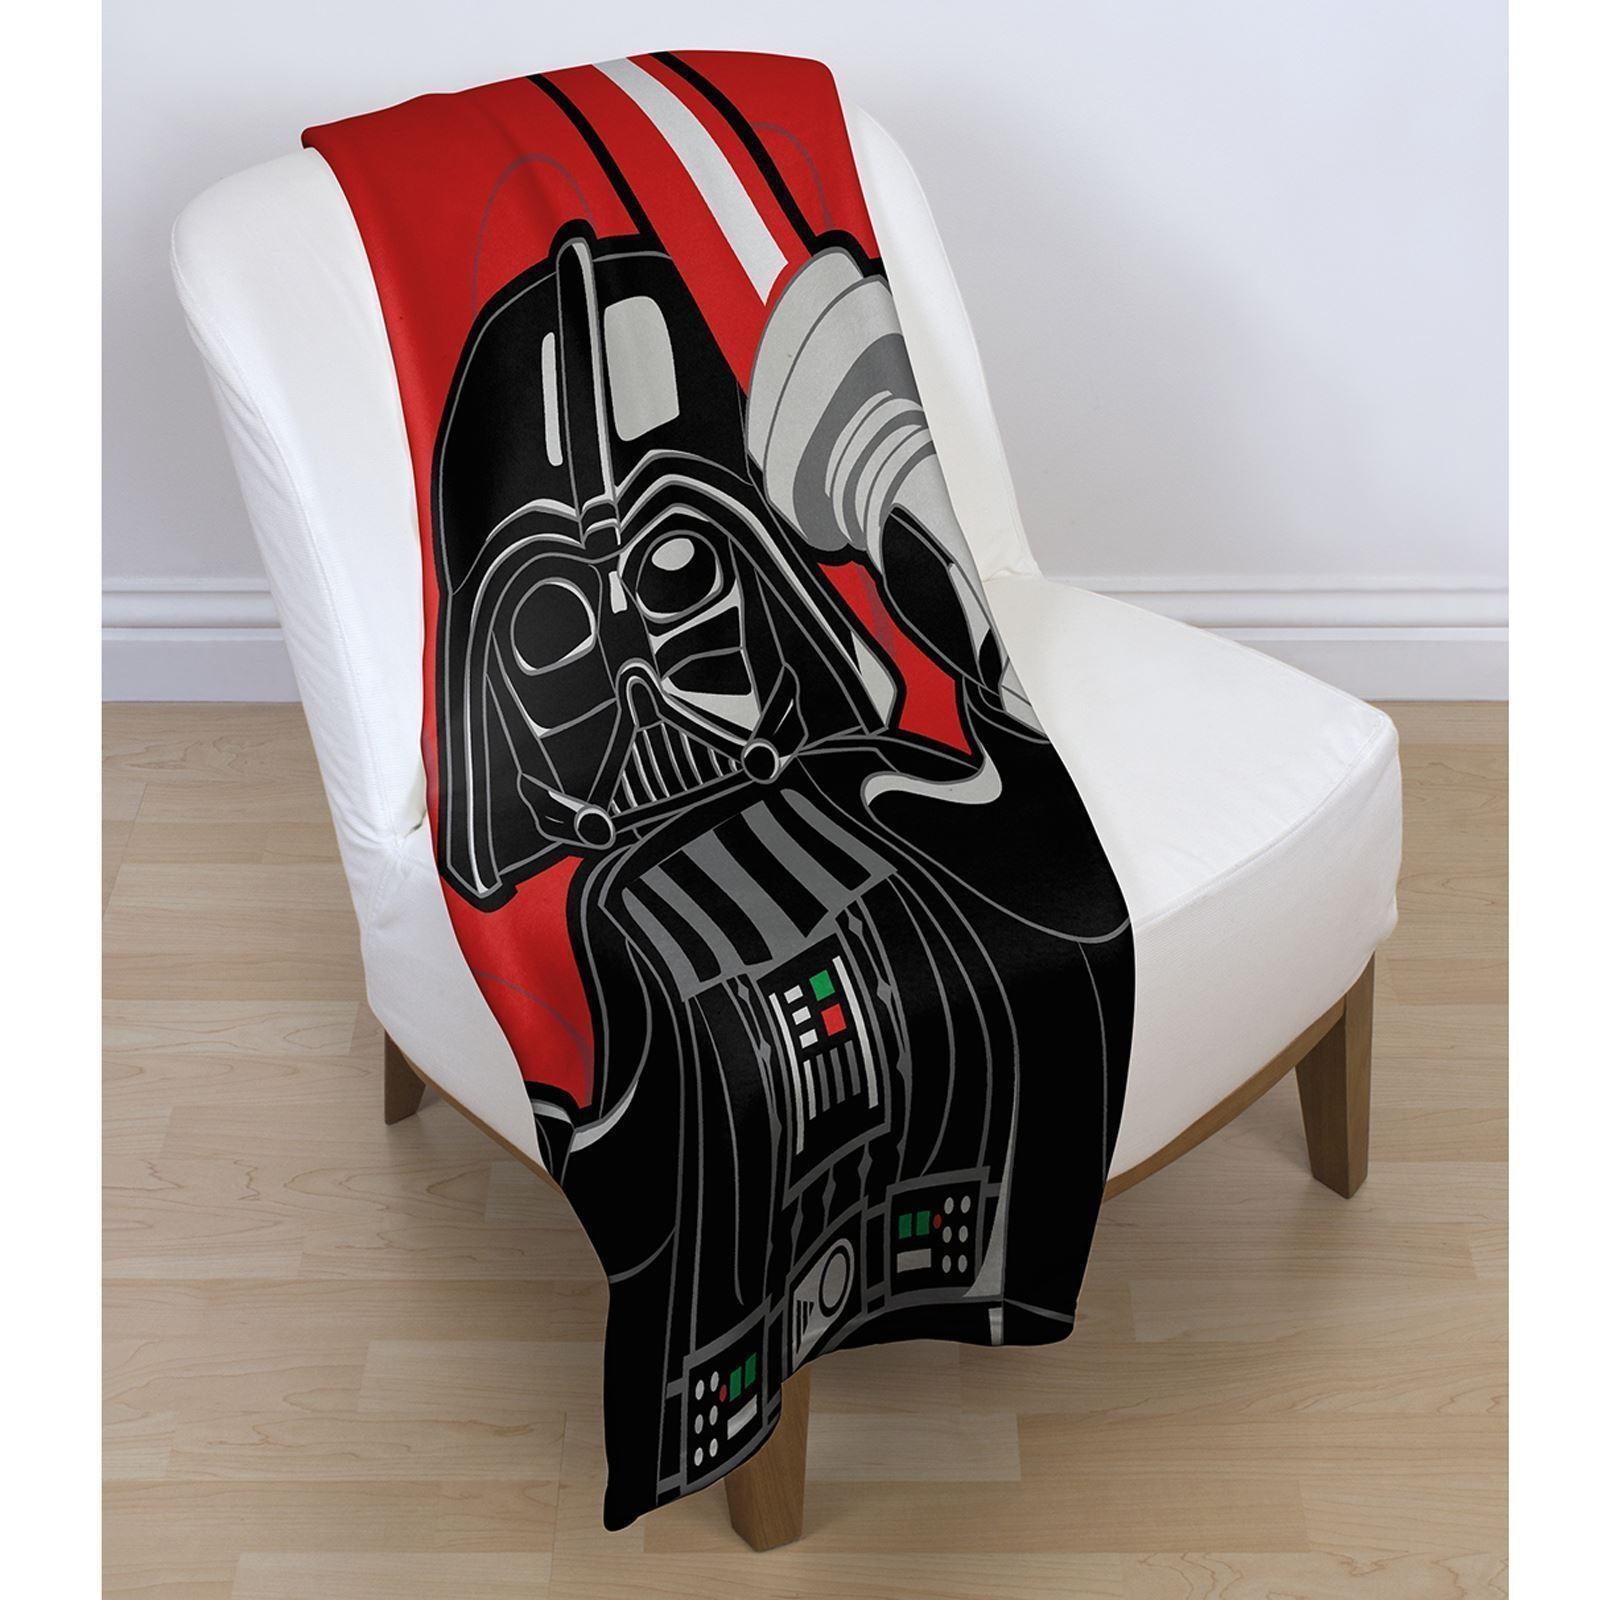 Official-Licensed-Fleece-Blanket-Bed-Throw-100-x-150cm-Fortnite-Disney-Lego-DC thumbnail 33